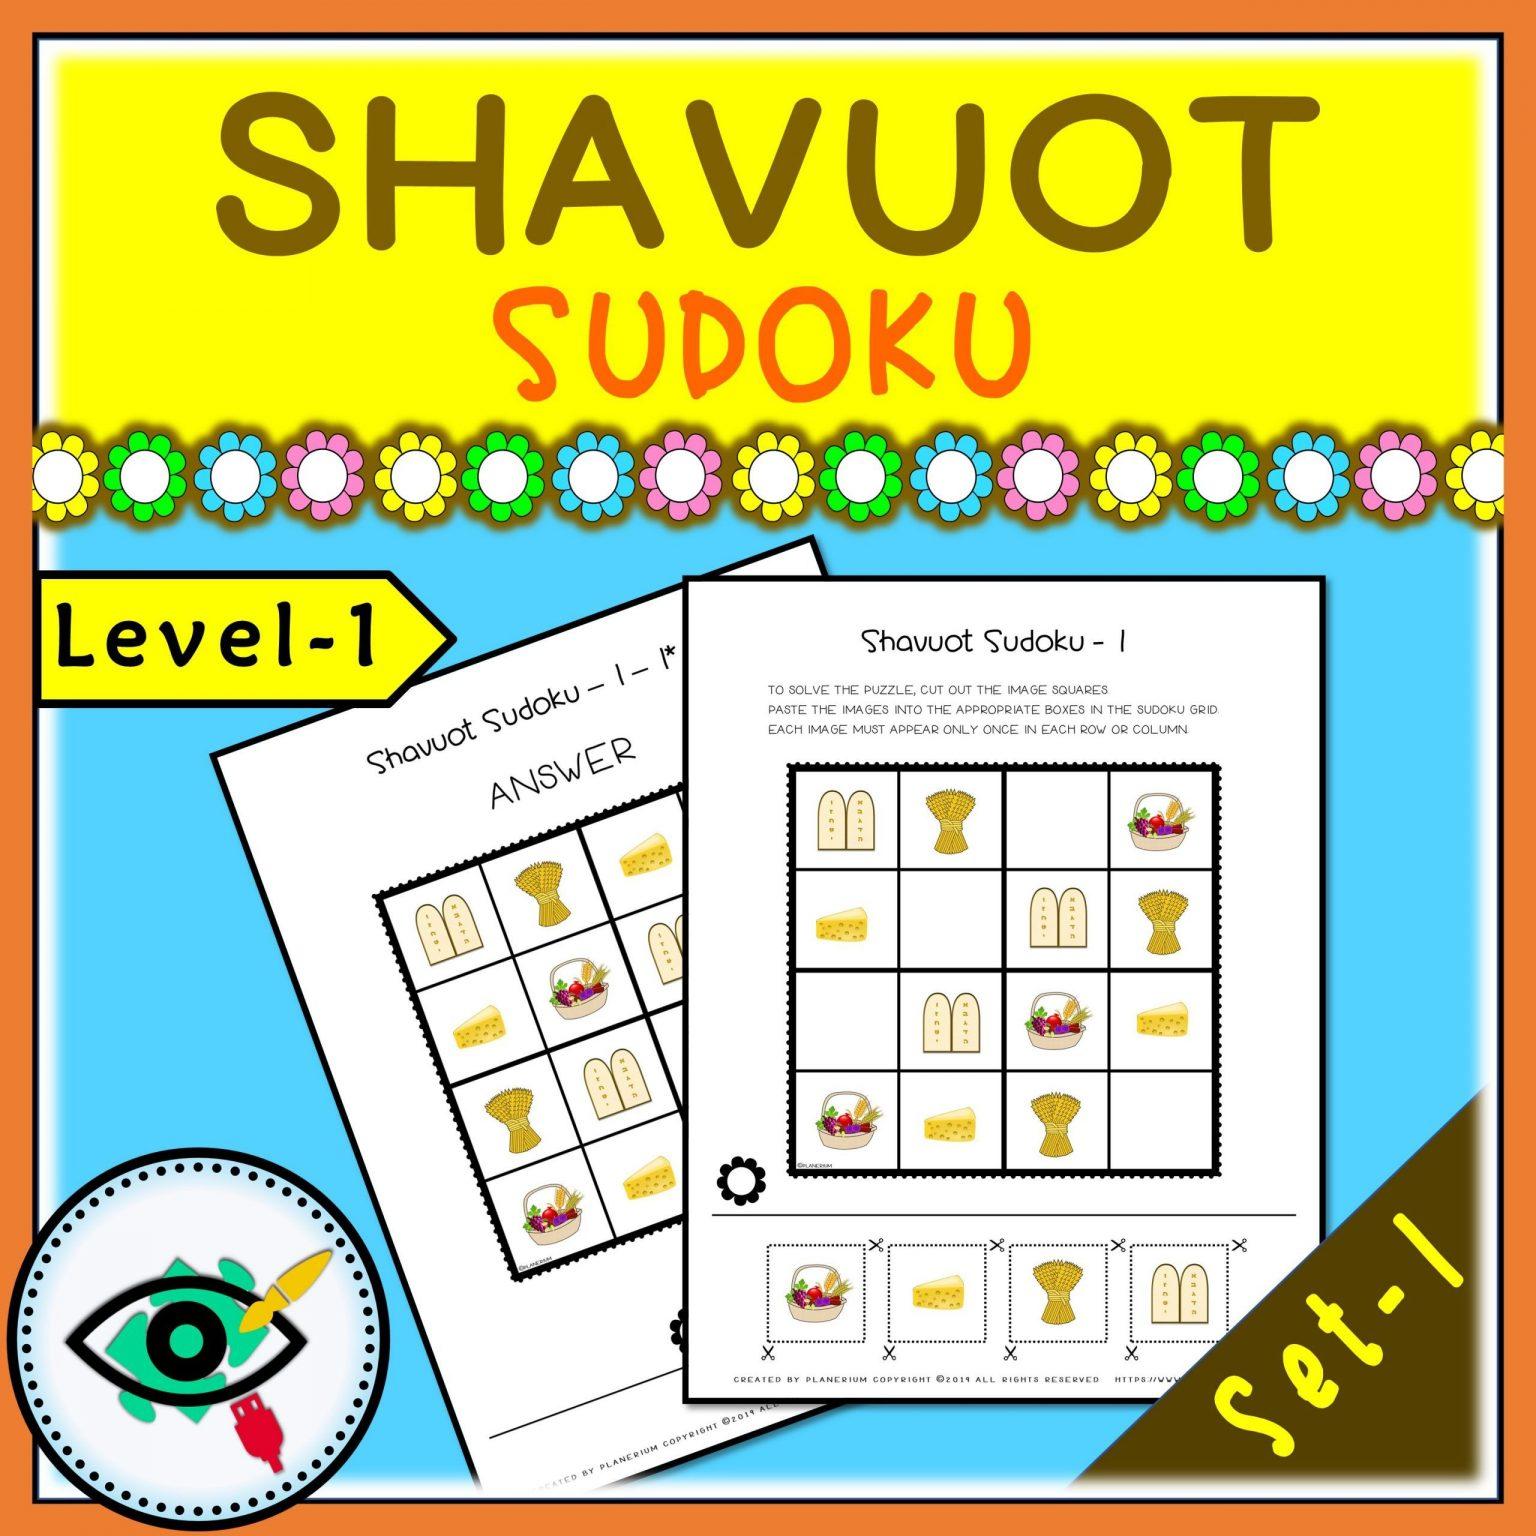 Shavuot - Sudoku Puzzle Game - Title 1